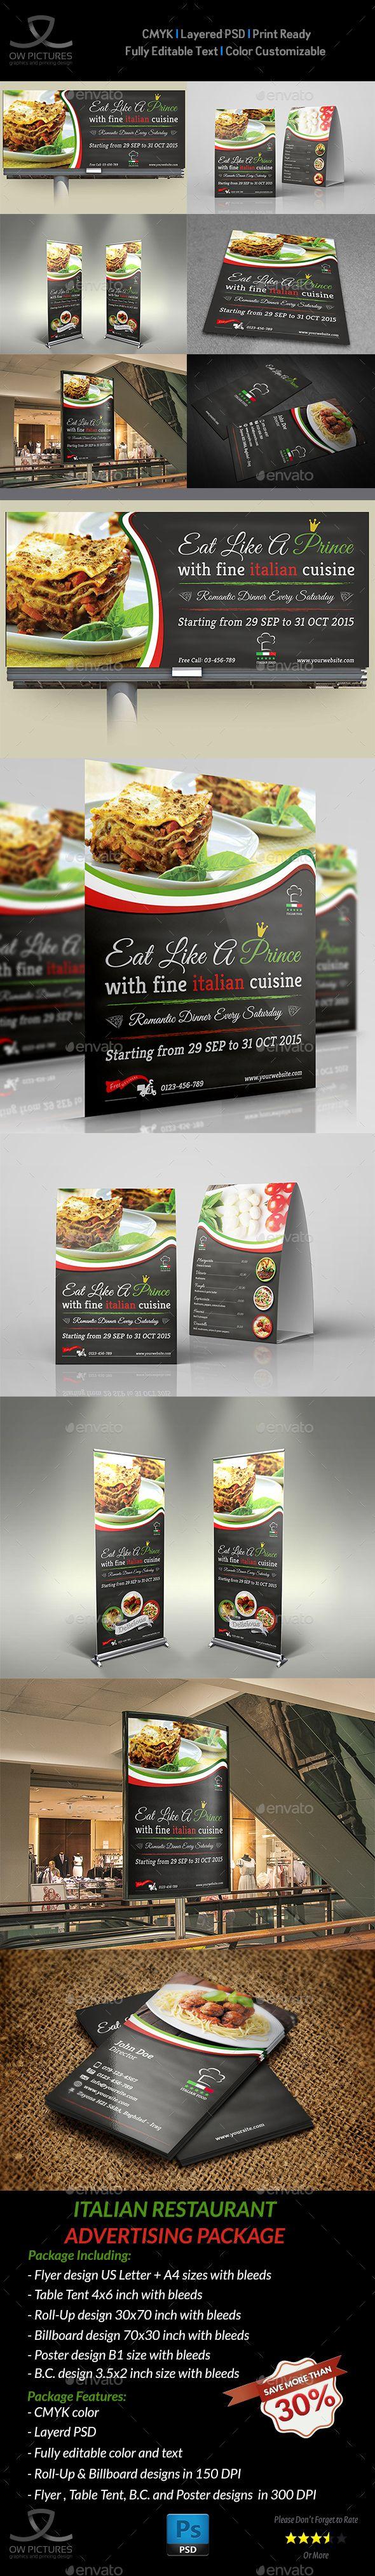 Advertising Bundle Description : Italian Restaurant Advertising Bundle including...